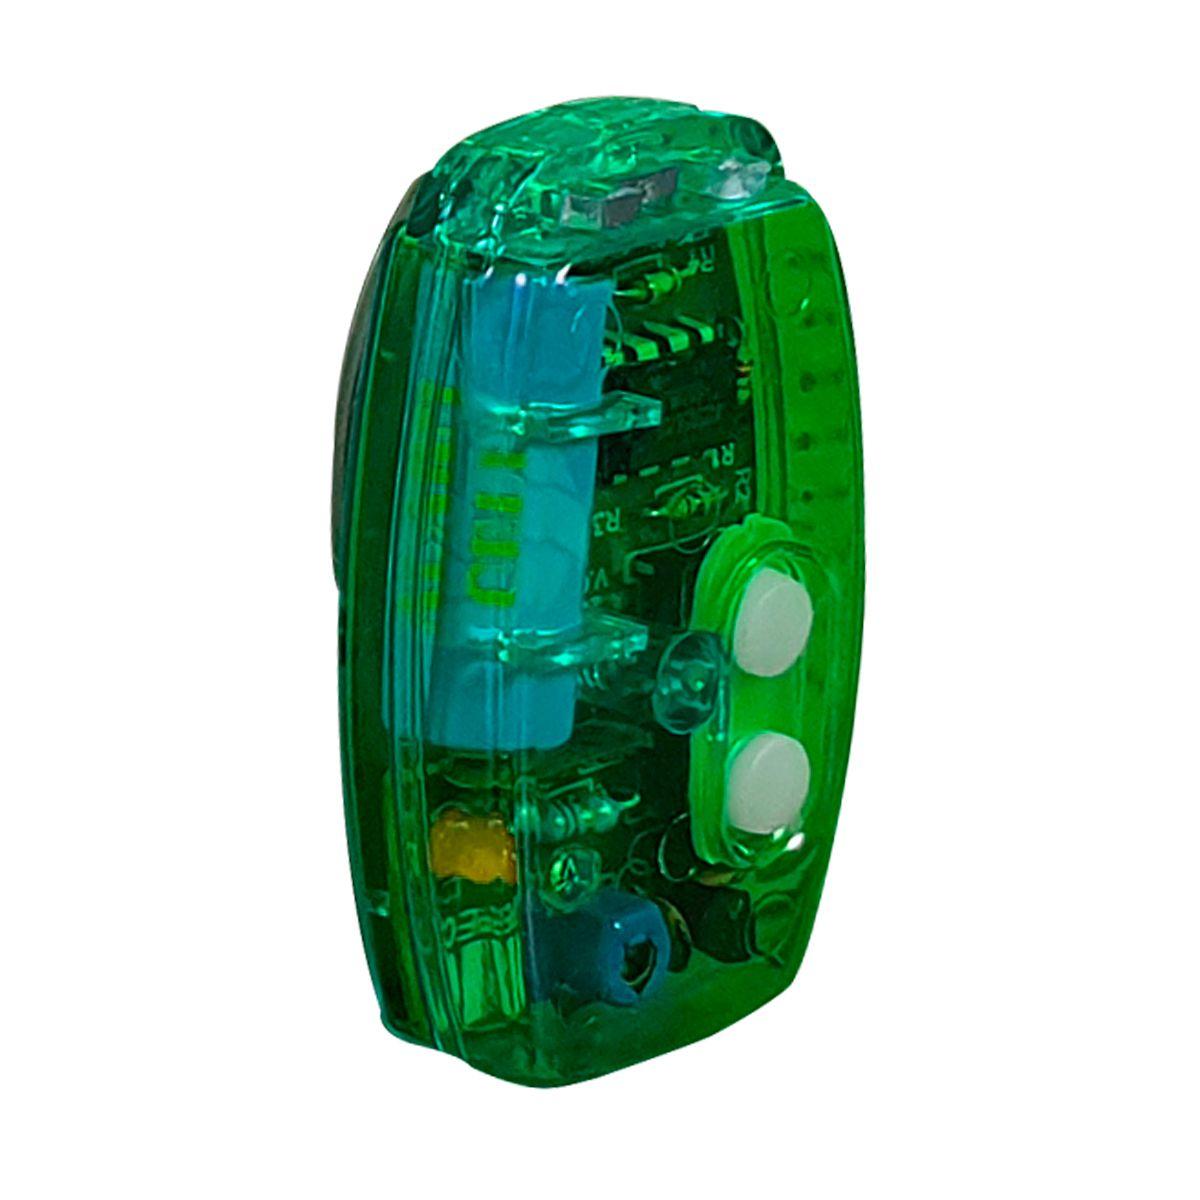 Controle Remoto TX Flex Ipec Verde  - Tudo Forte